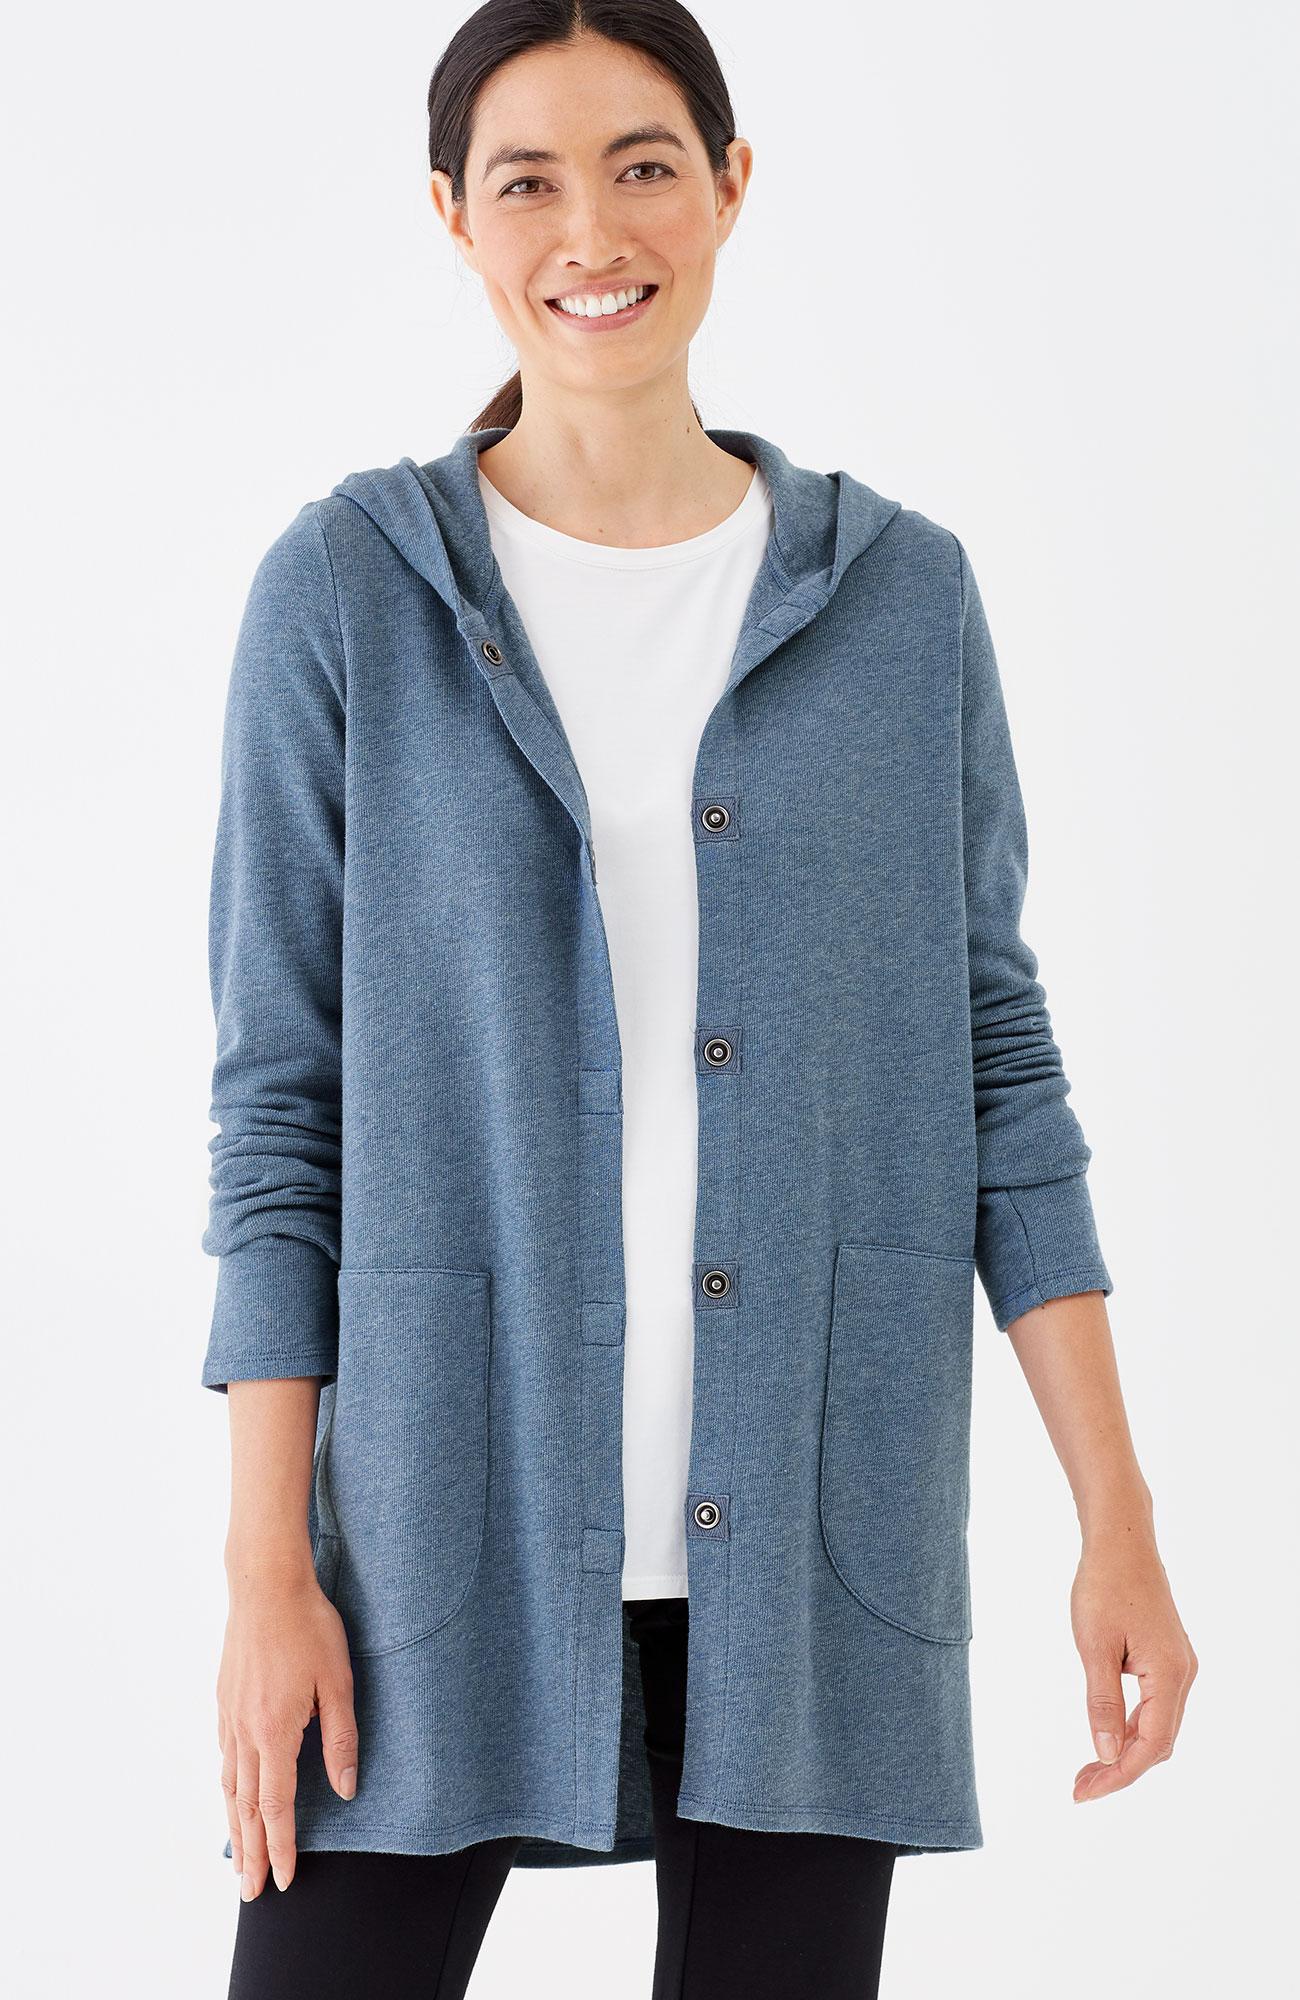 Pure Jill elliptical hoodie